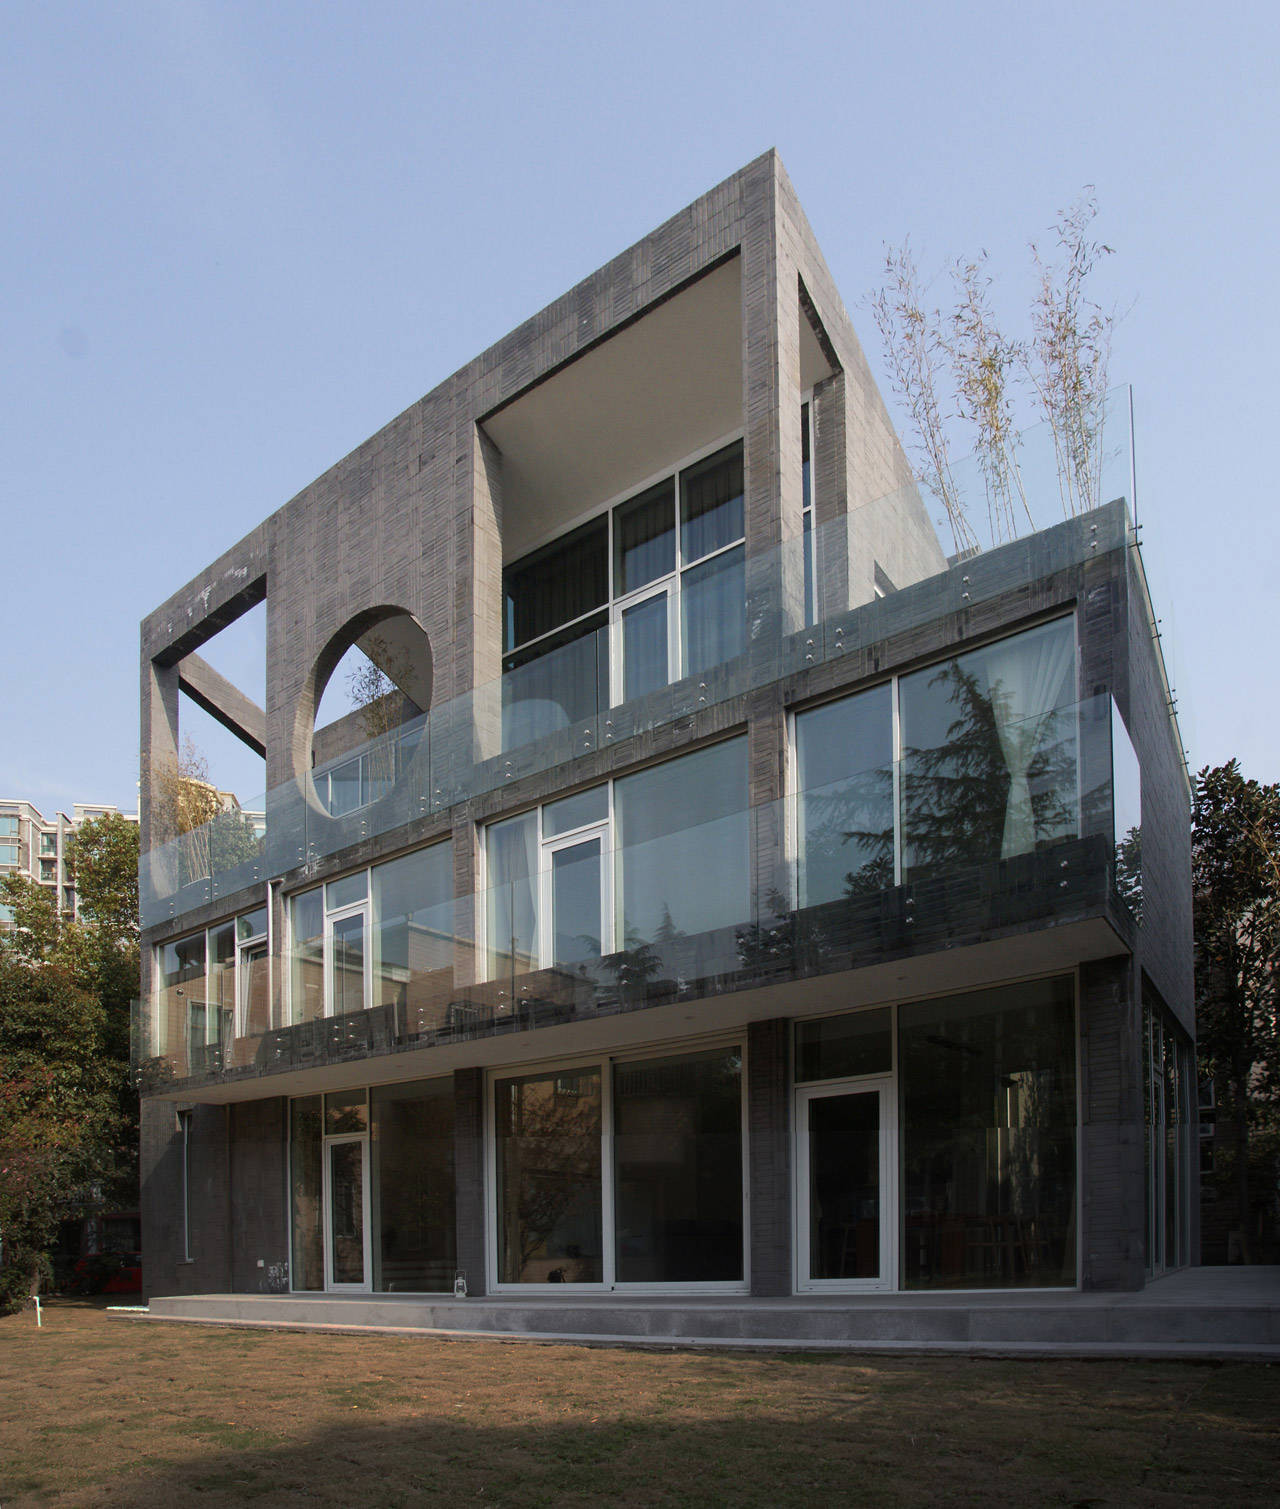 Villa A / QSJW Architects, Courtesy of  qsjw architects